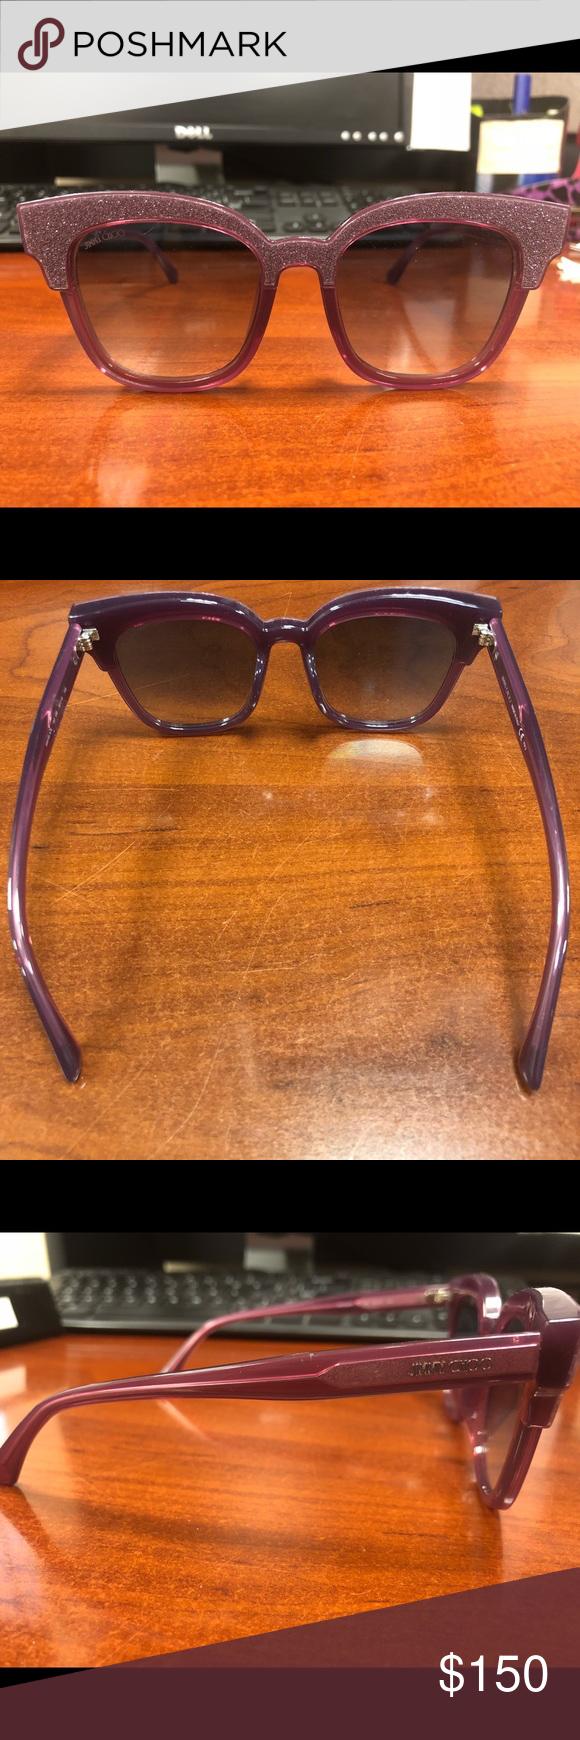 1ea414239b1 Jimmy Choo Sunglasses Jimmy Choo Mayela S Purple Sunglasses Brand New w o  box 100% Authentic Jimmy Choo Accessories Sunglasses